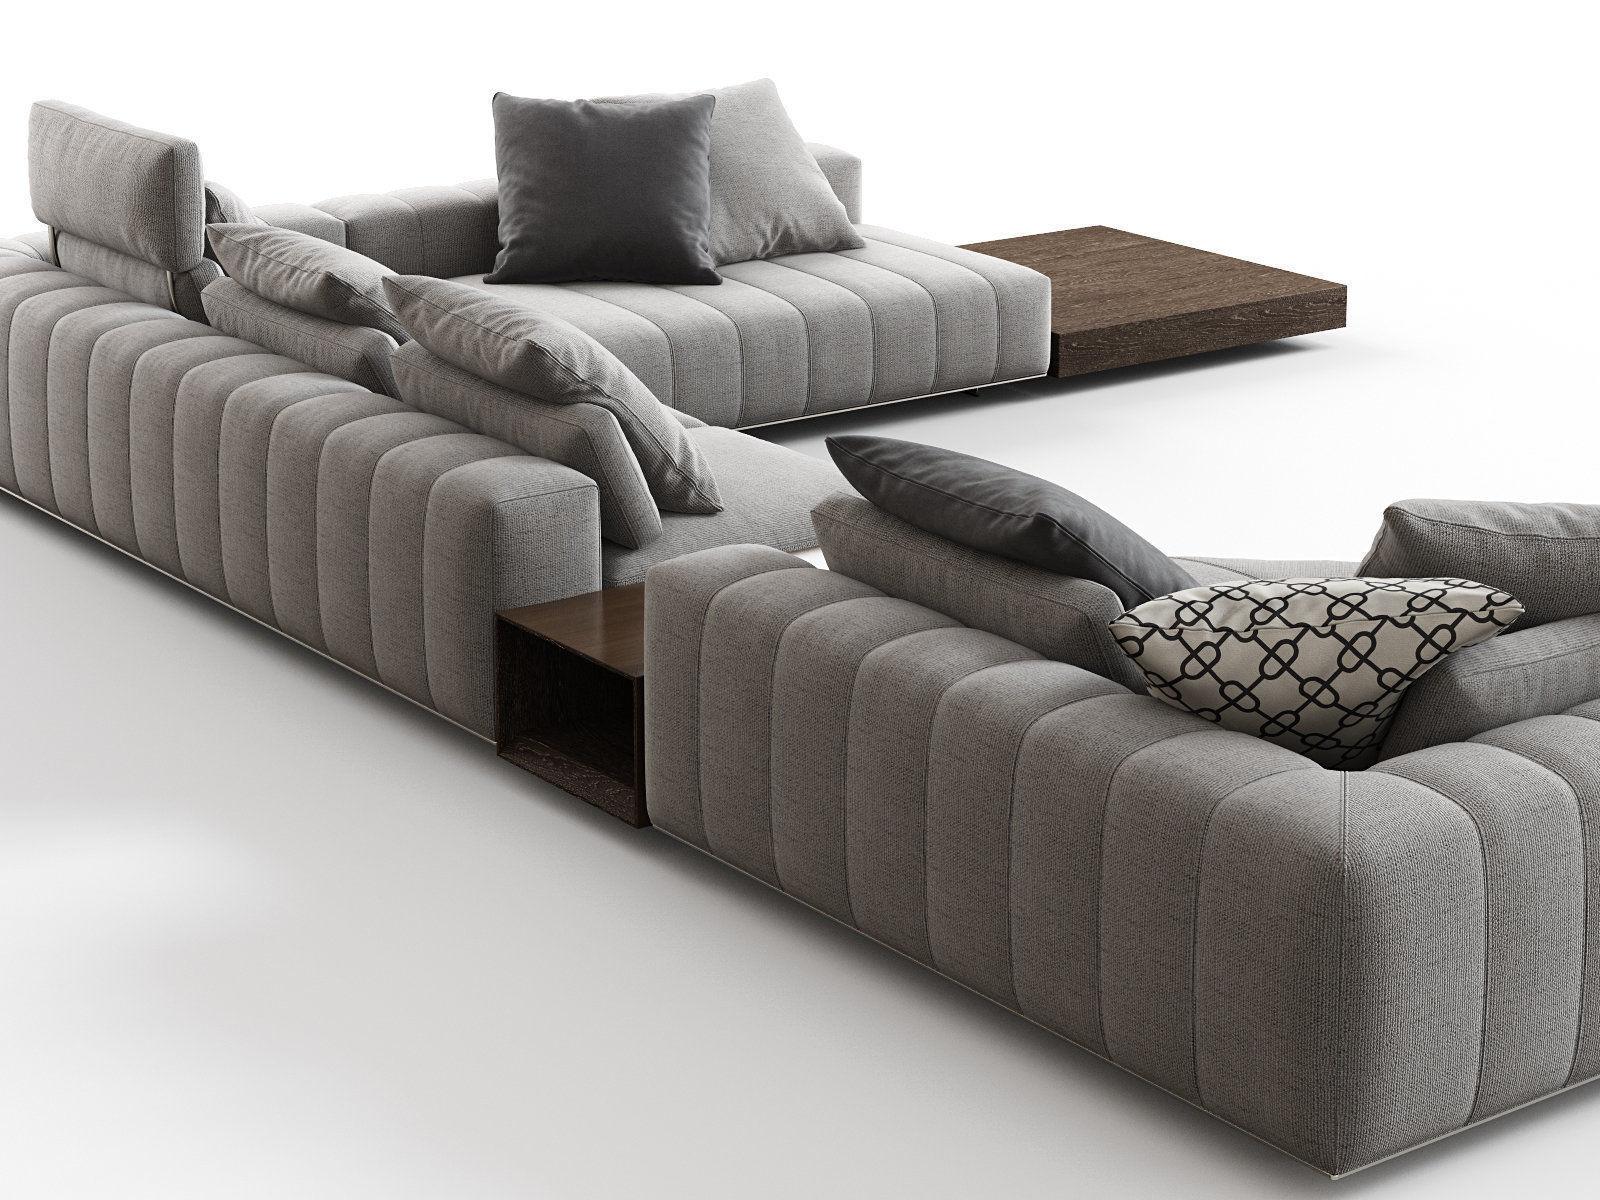 Freeman Corner Sofa System G